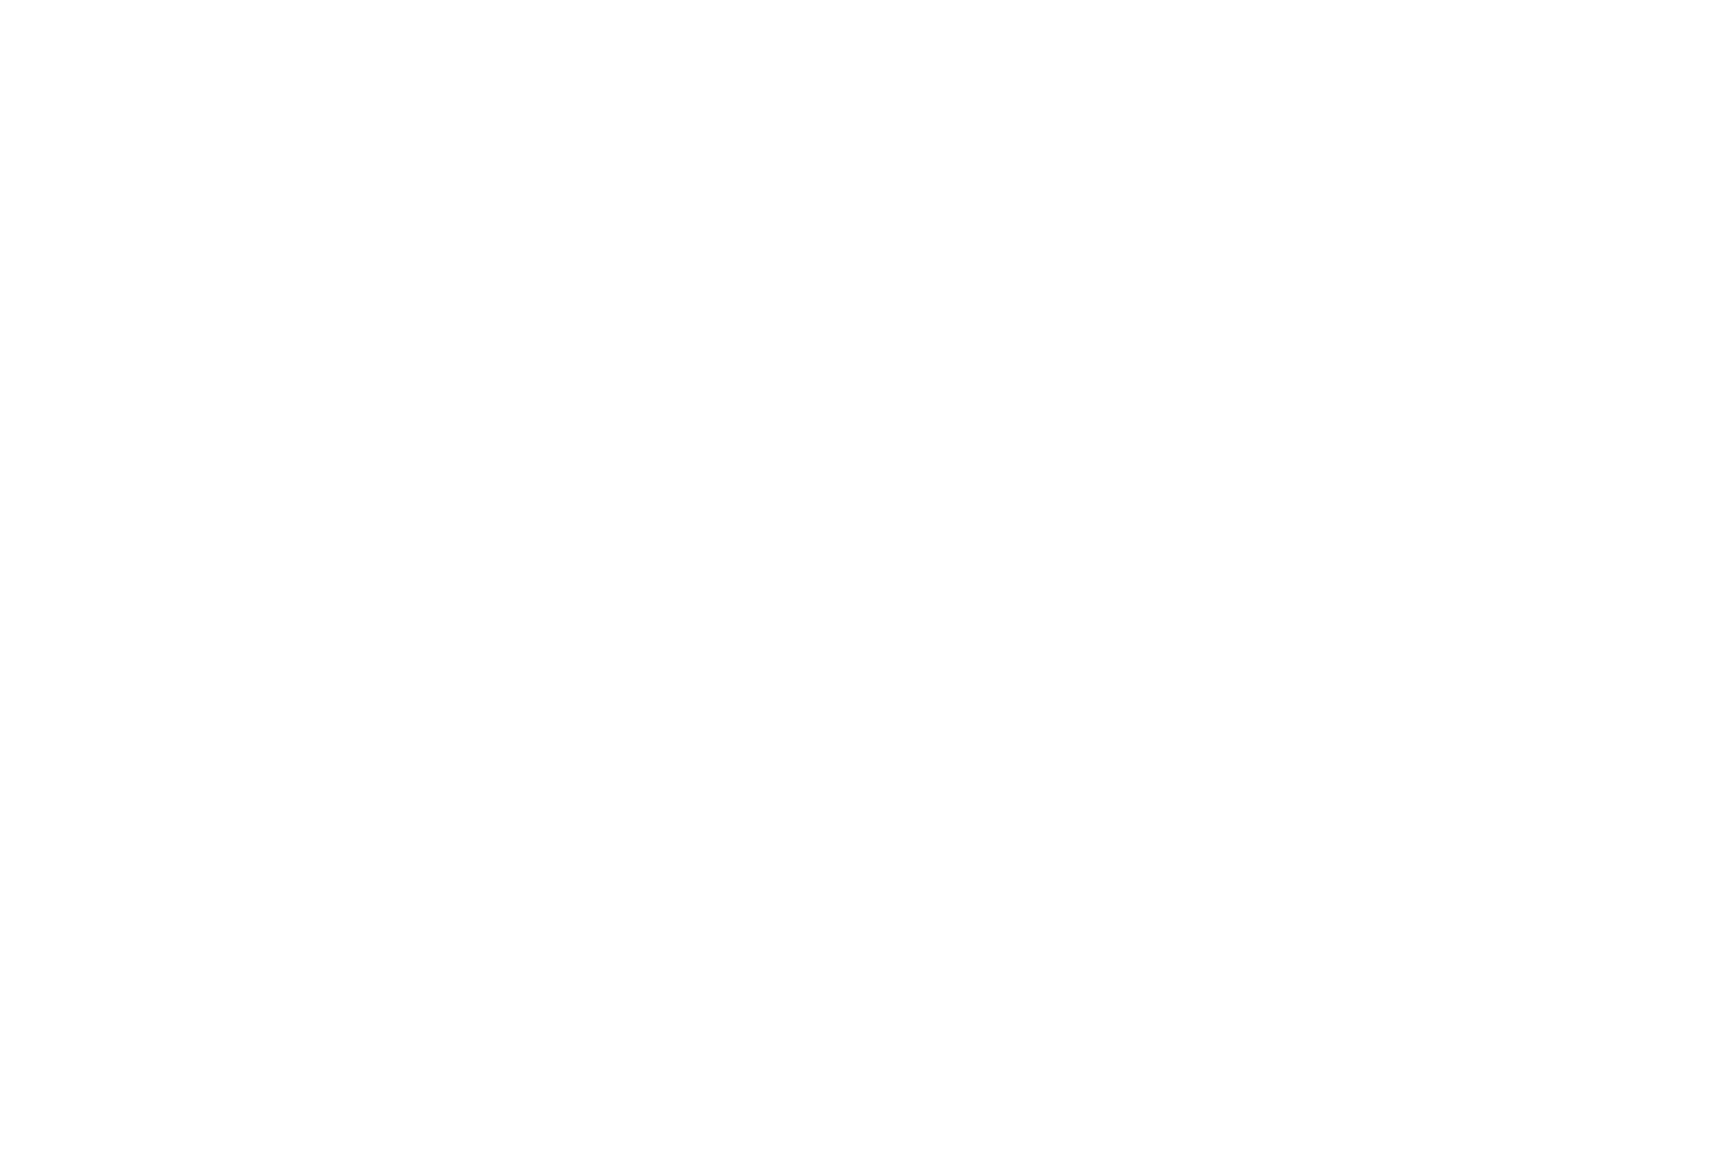 Bentonville Film Festival - May 3 & 5, 2018